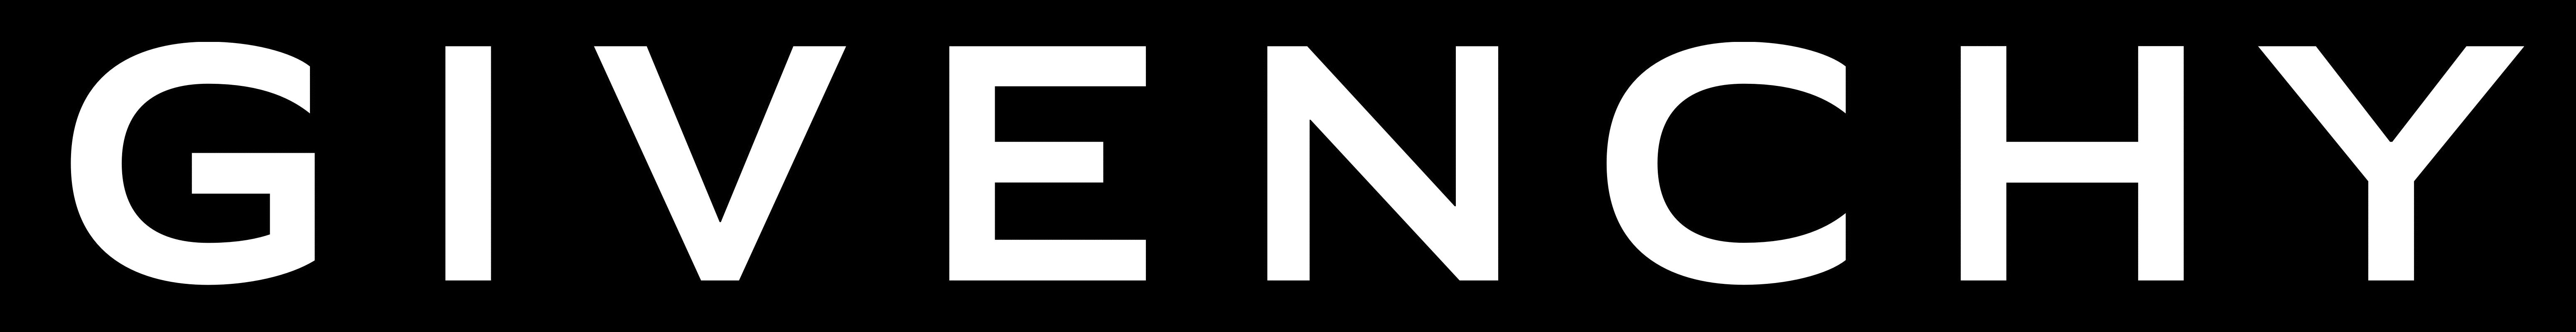 givenchy logos download manchester united logo jersey manchester united logo jpg